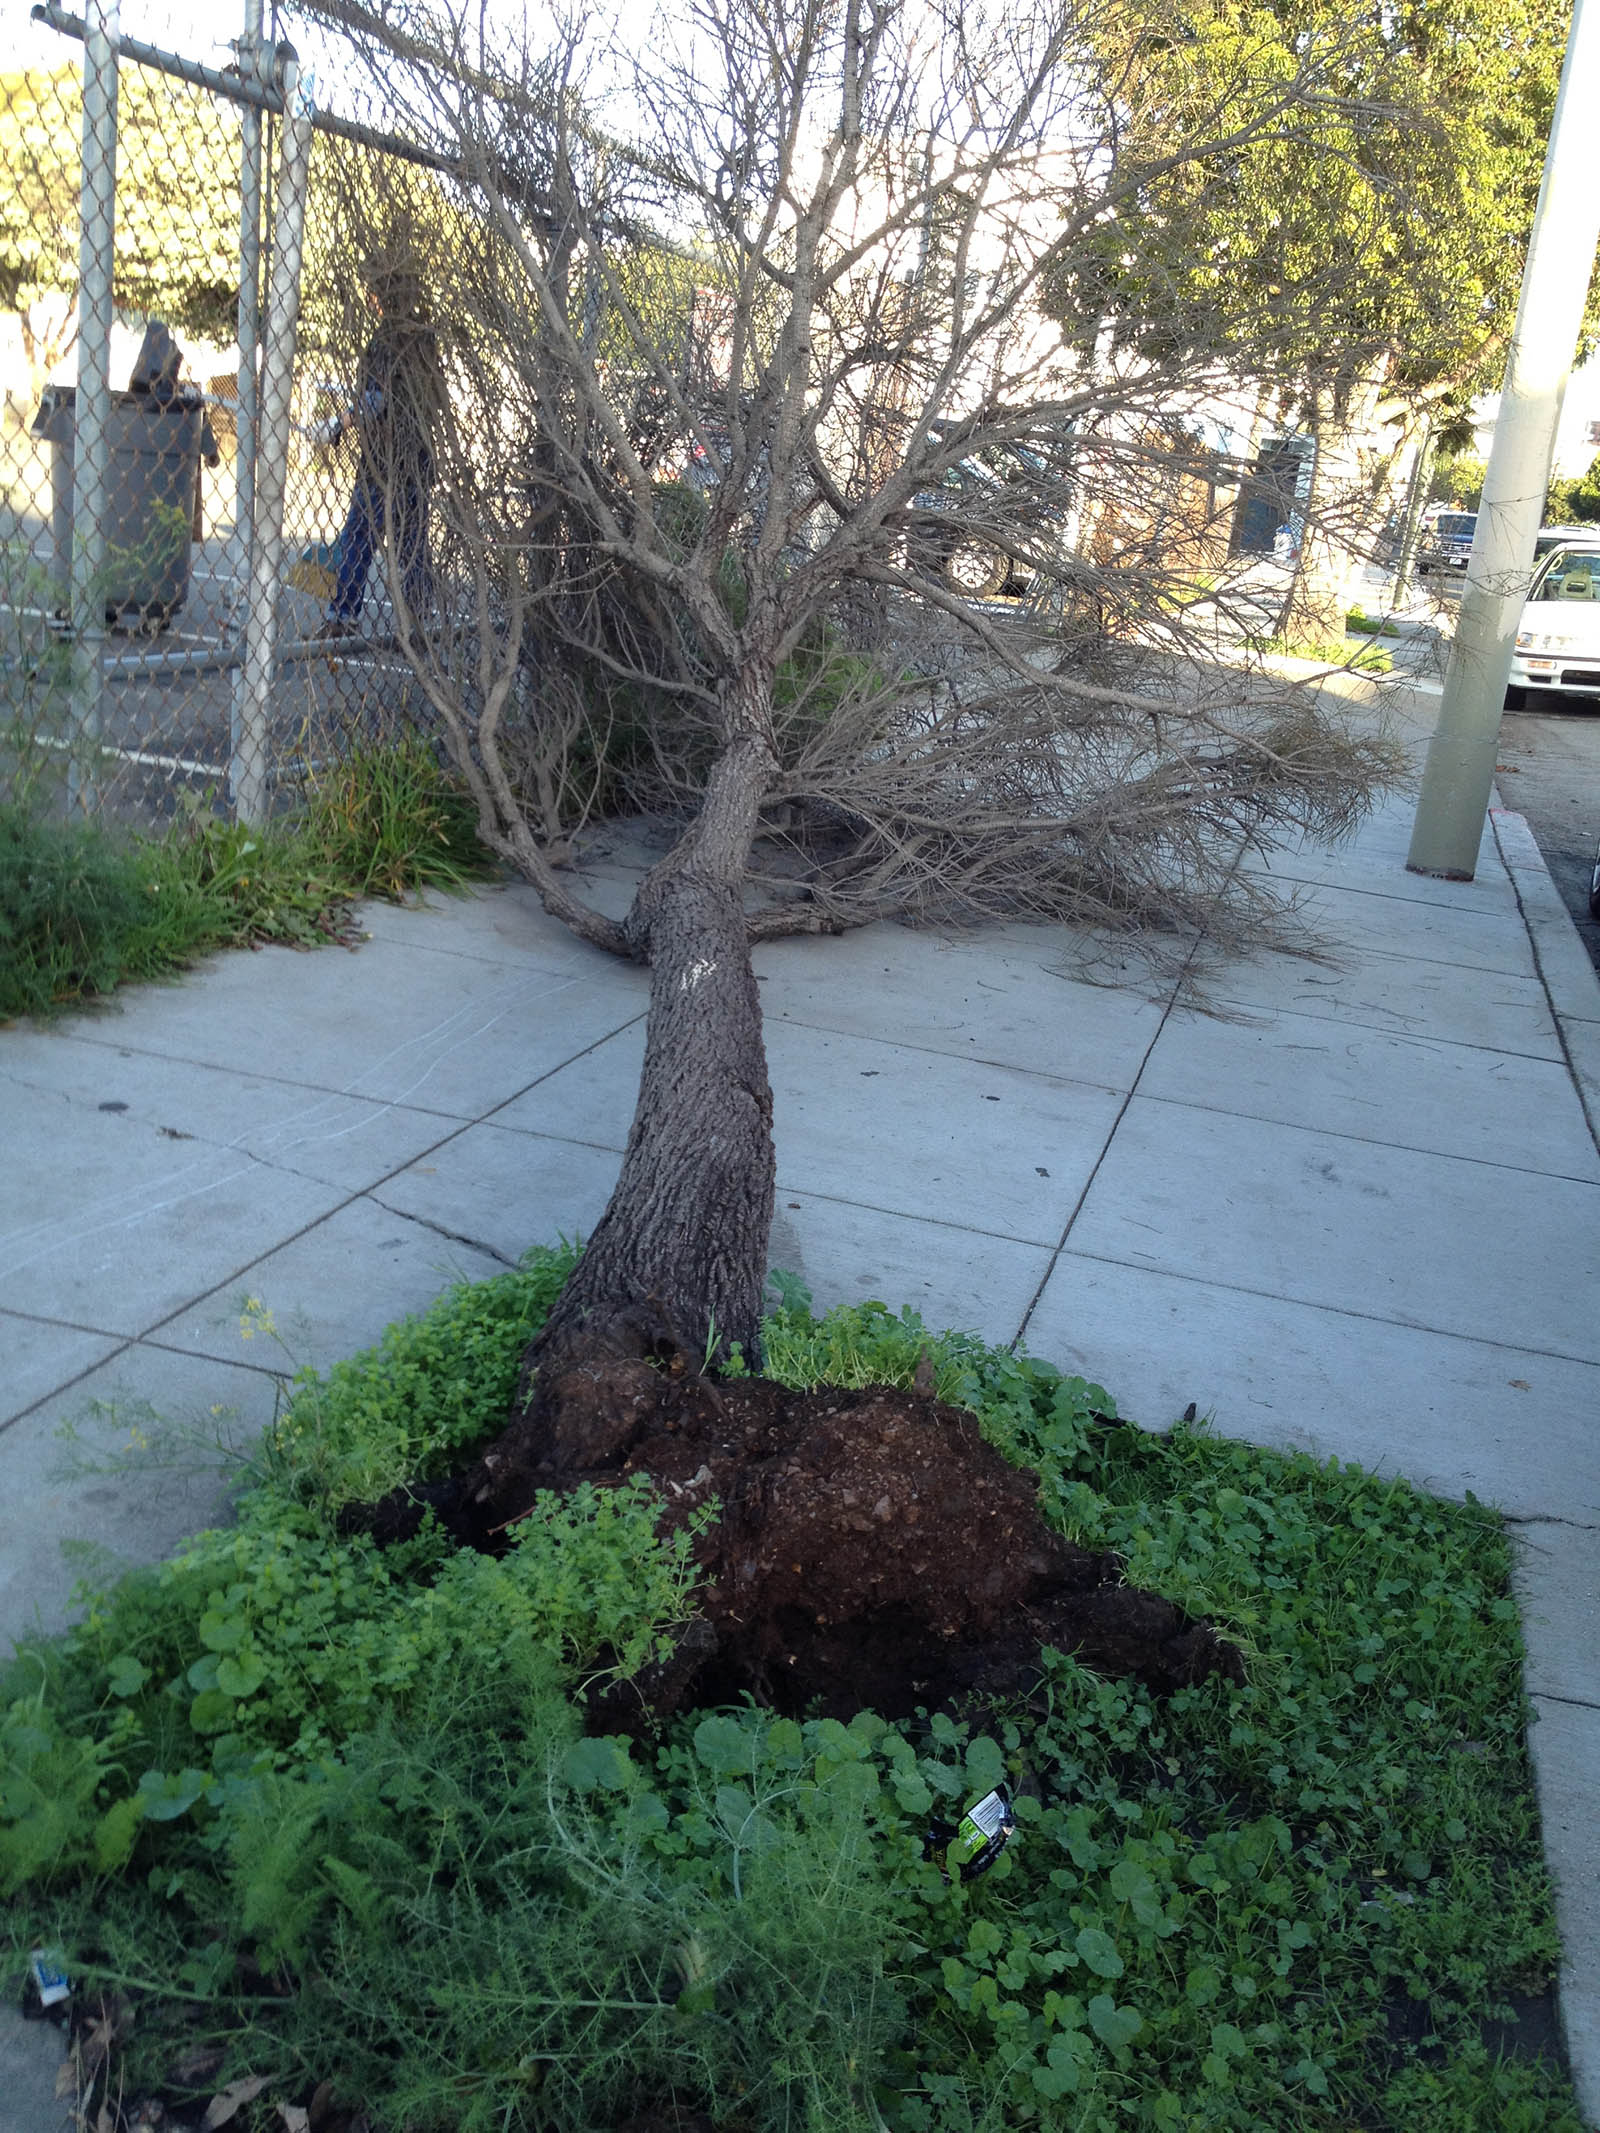 SNAP: If a Tree Falls